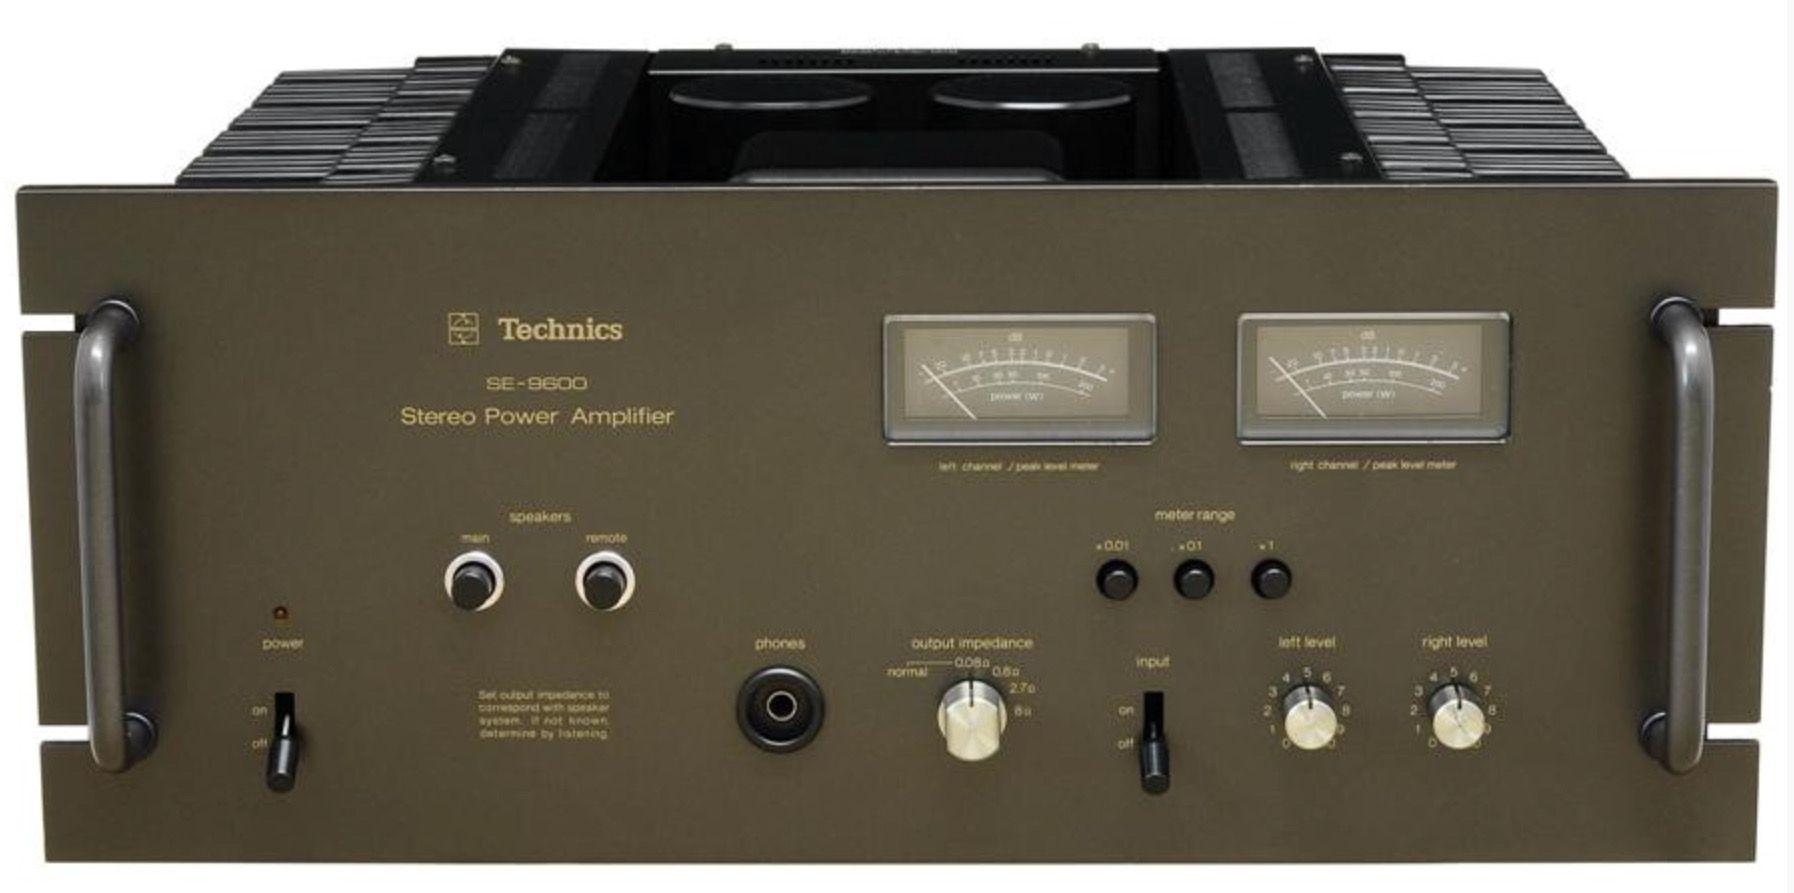 Technics SE-9600 Power Amplifiers